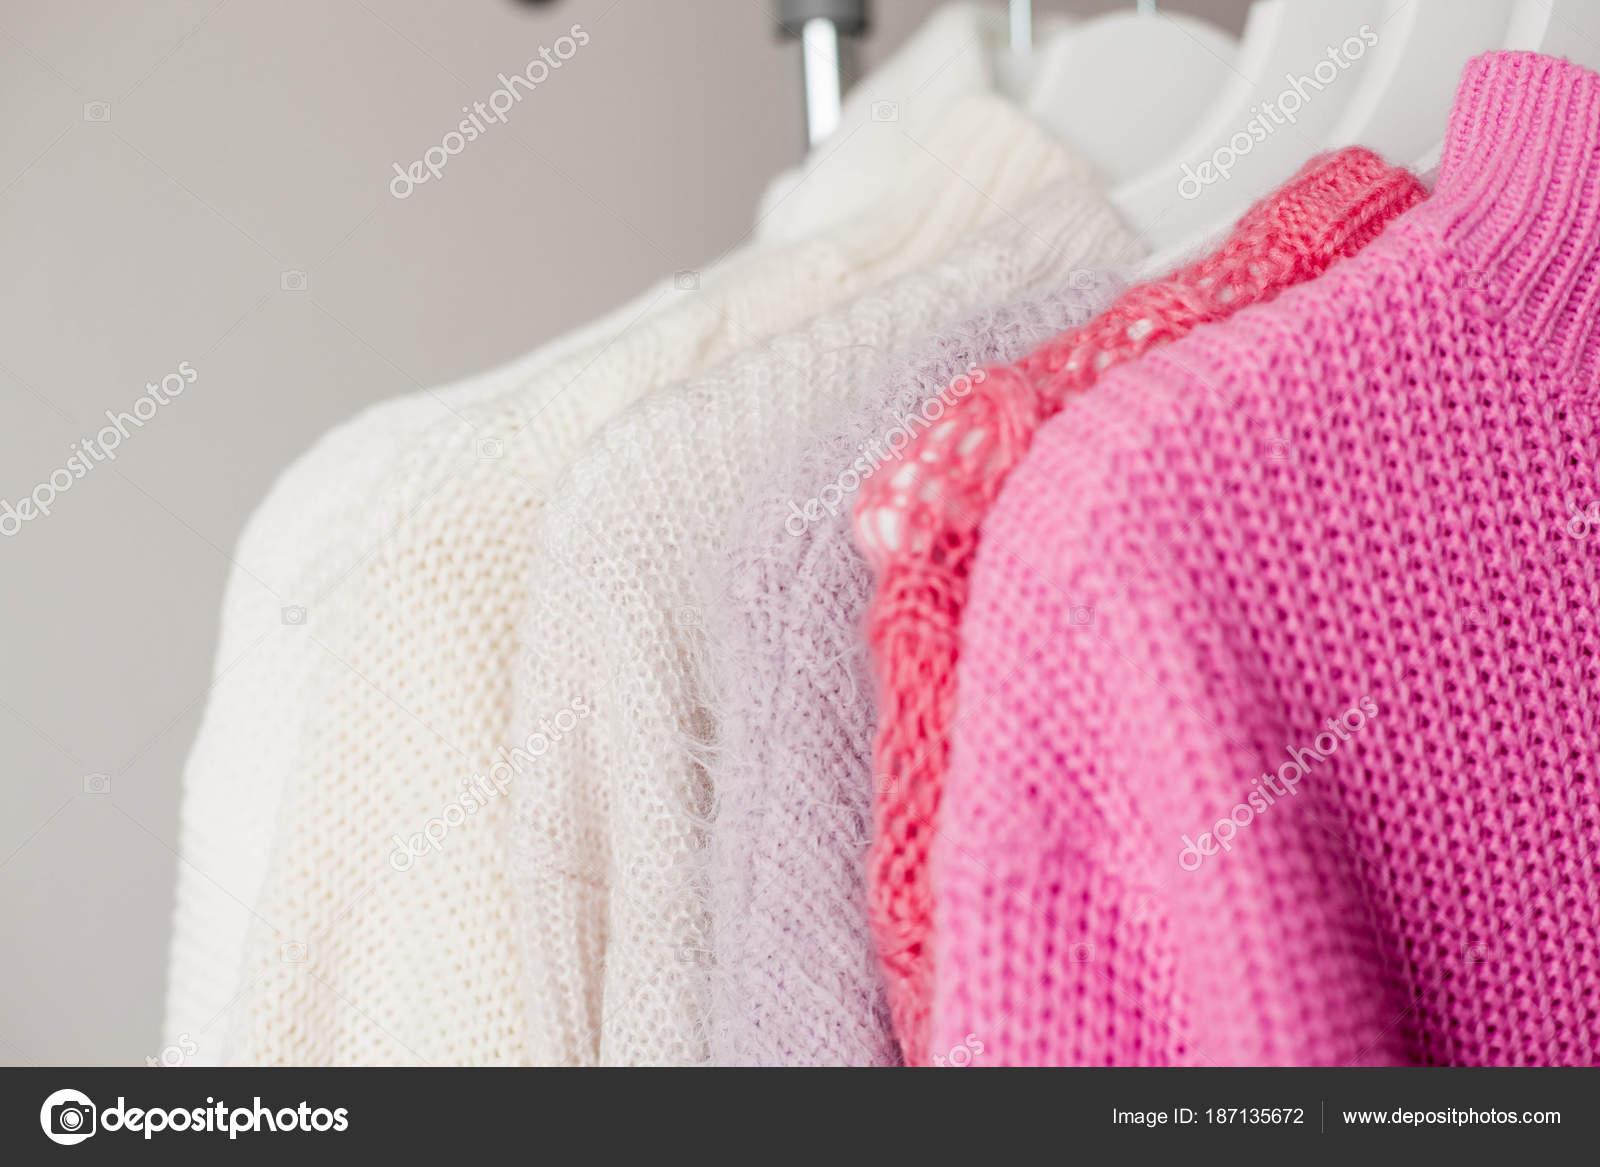 4c9676cd97b Μια κρεμάστρα με τα πράγματα. Πλεκτό πουλόβερ κρεμάστε στις κρεμάστρες.  Λαμπερό πουλόβερ. Άνοιξη ρούχα. Μόδα. Άνετο. Αρχική σελίδα.